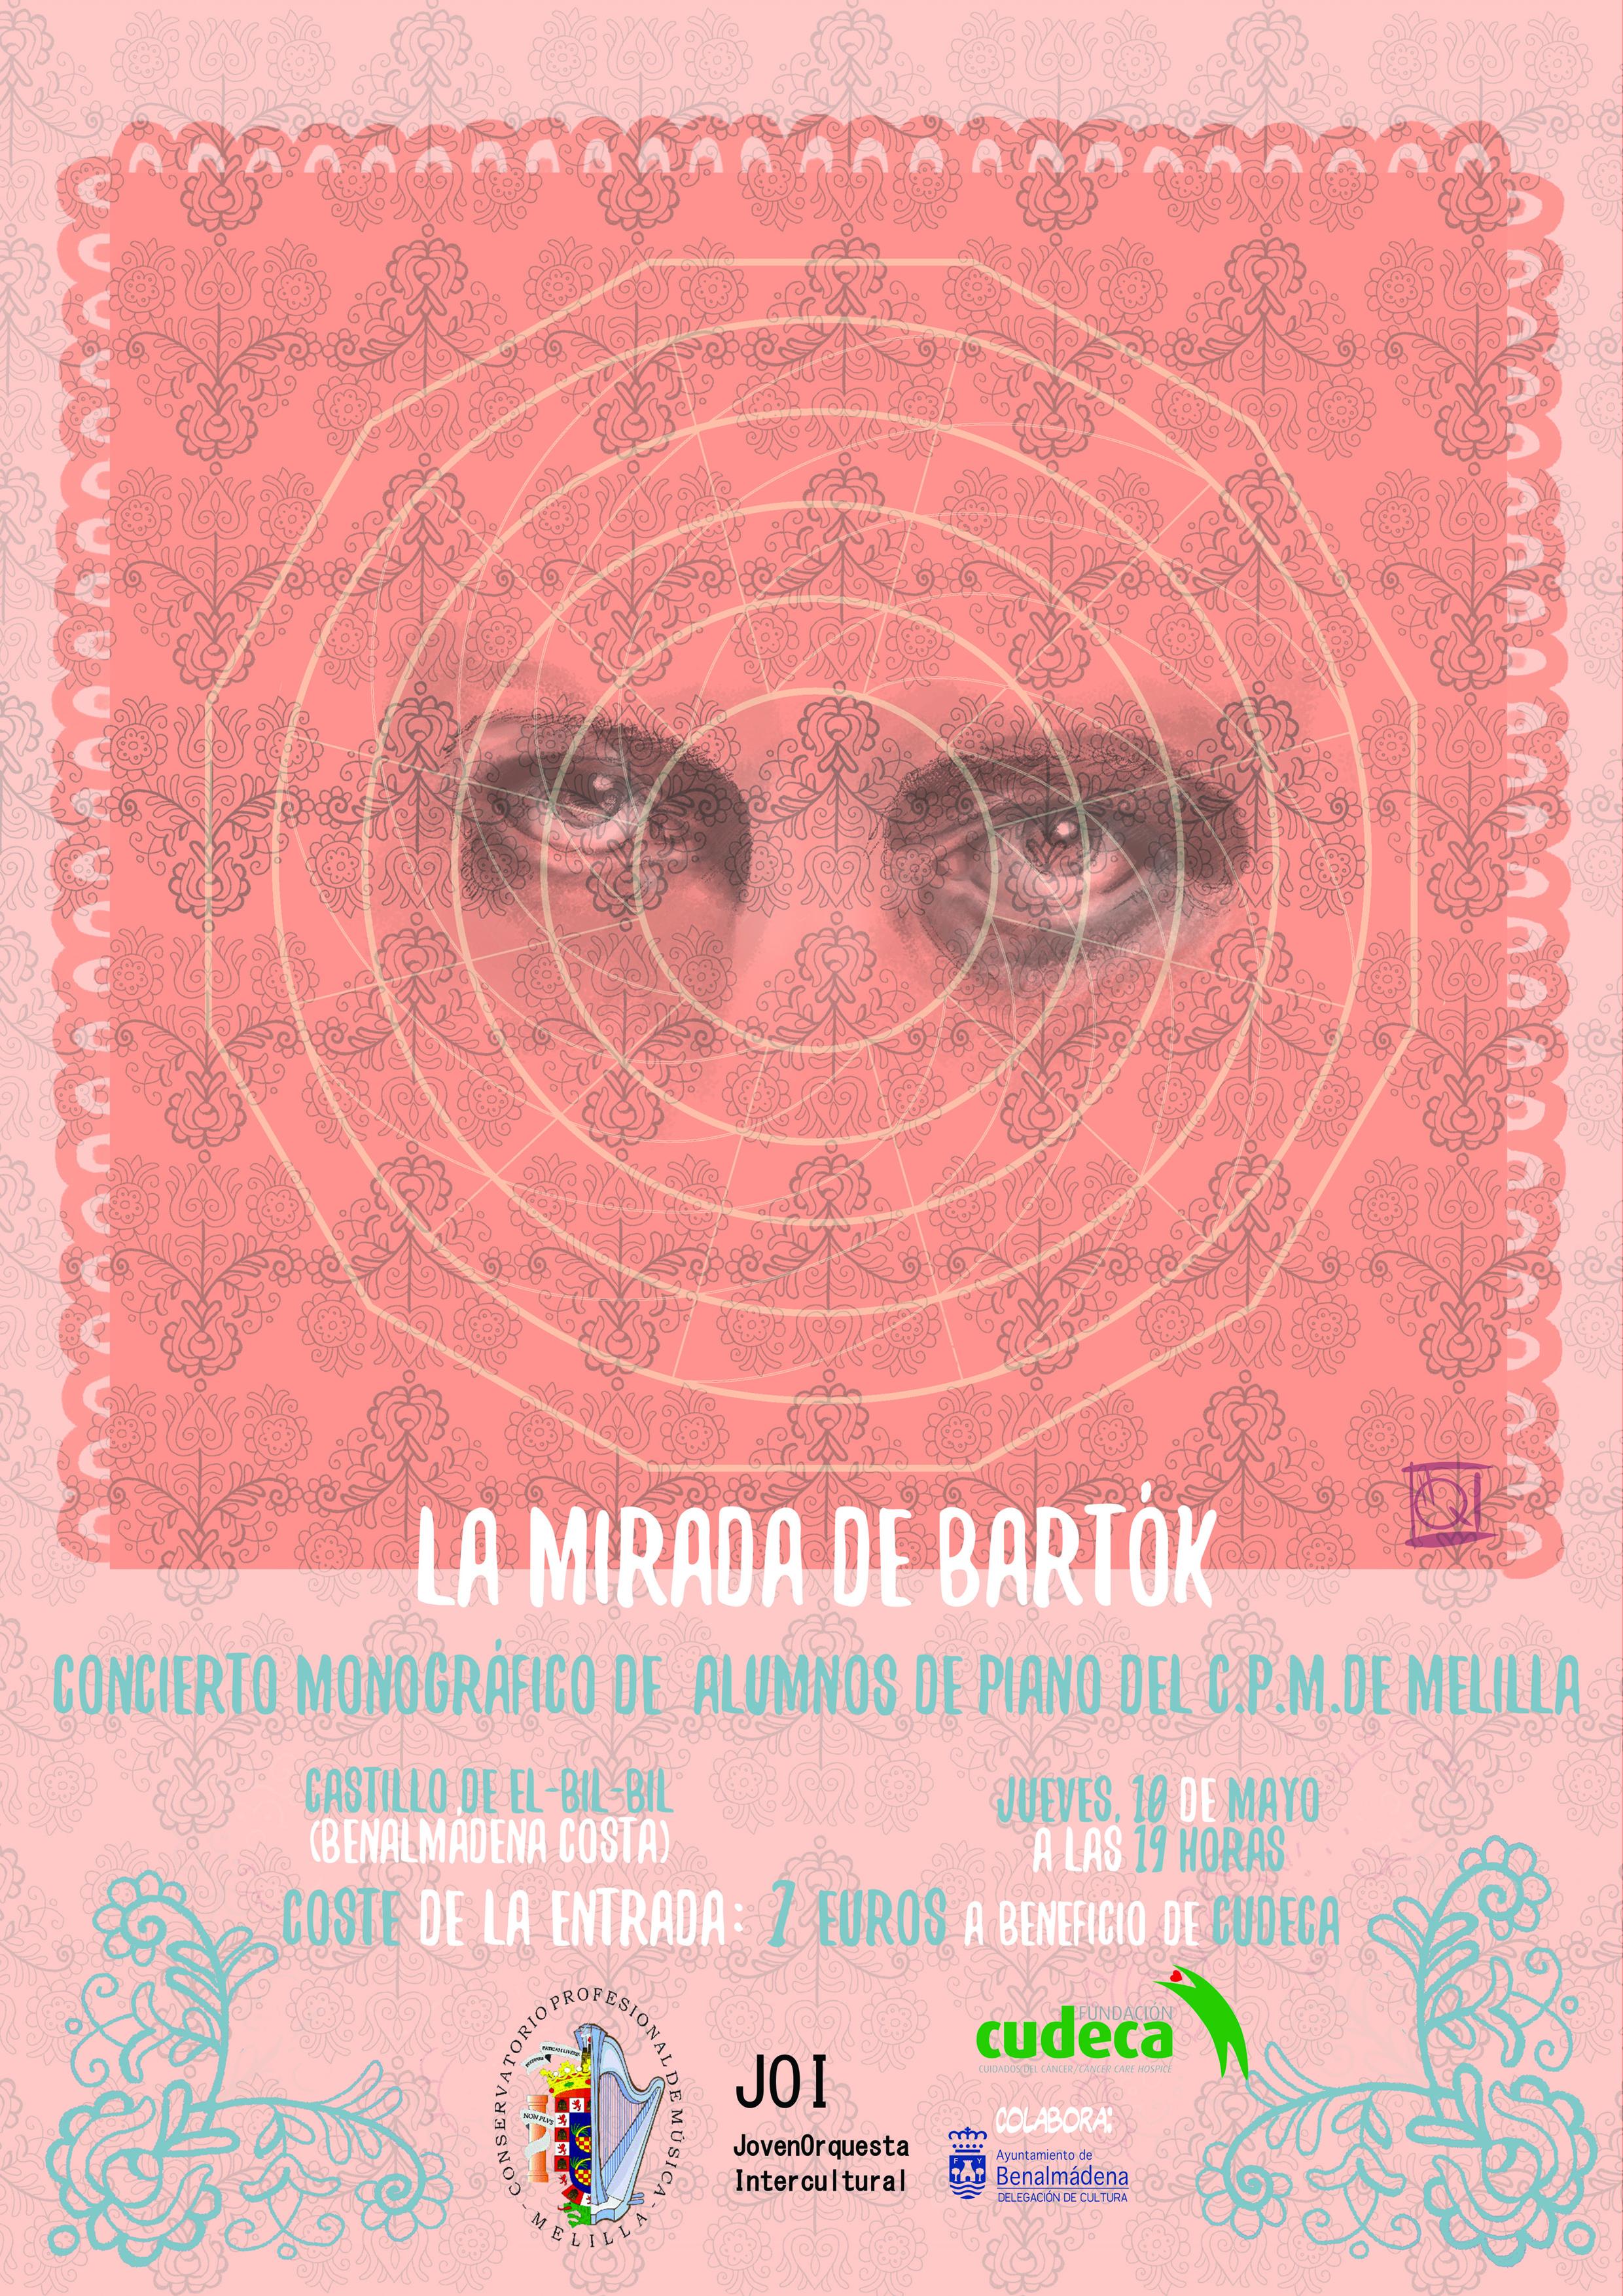 La Mirada de Bartok